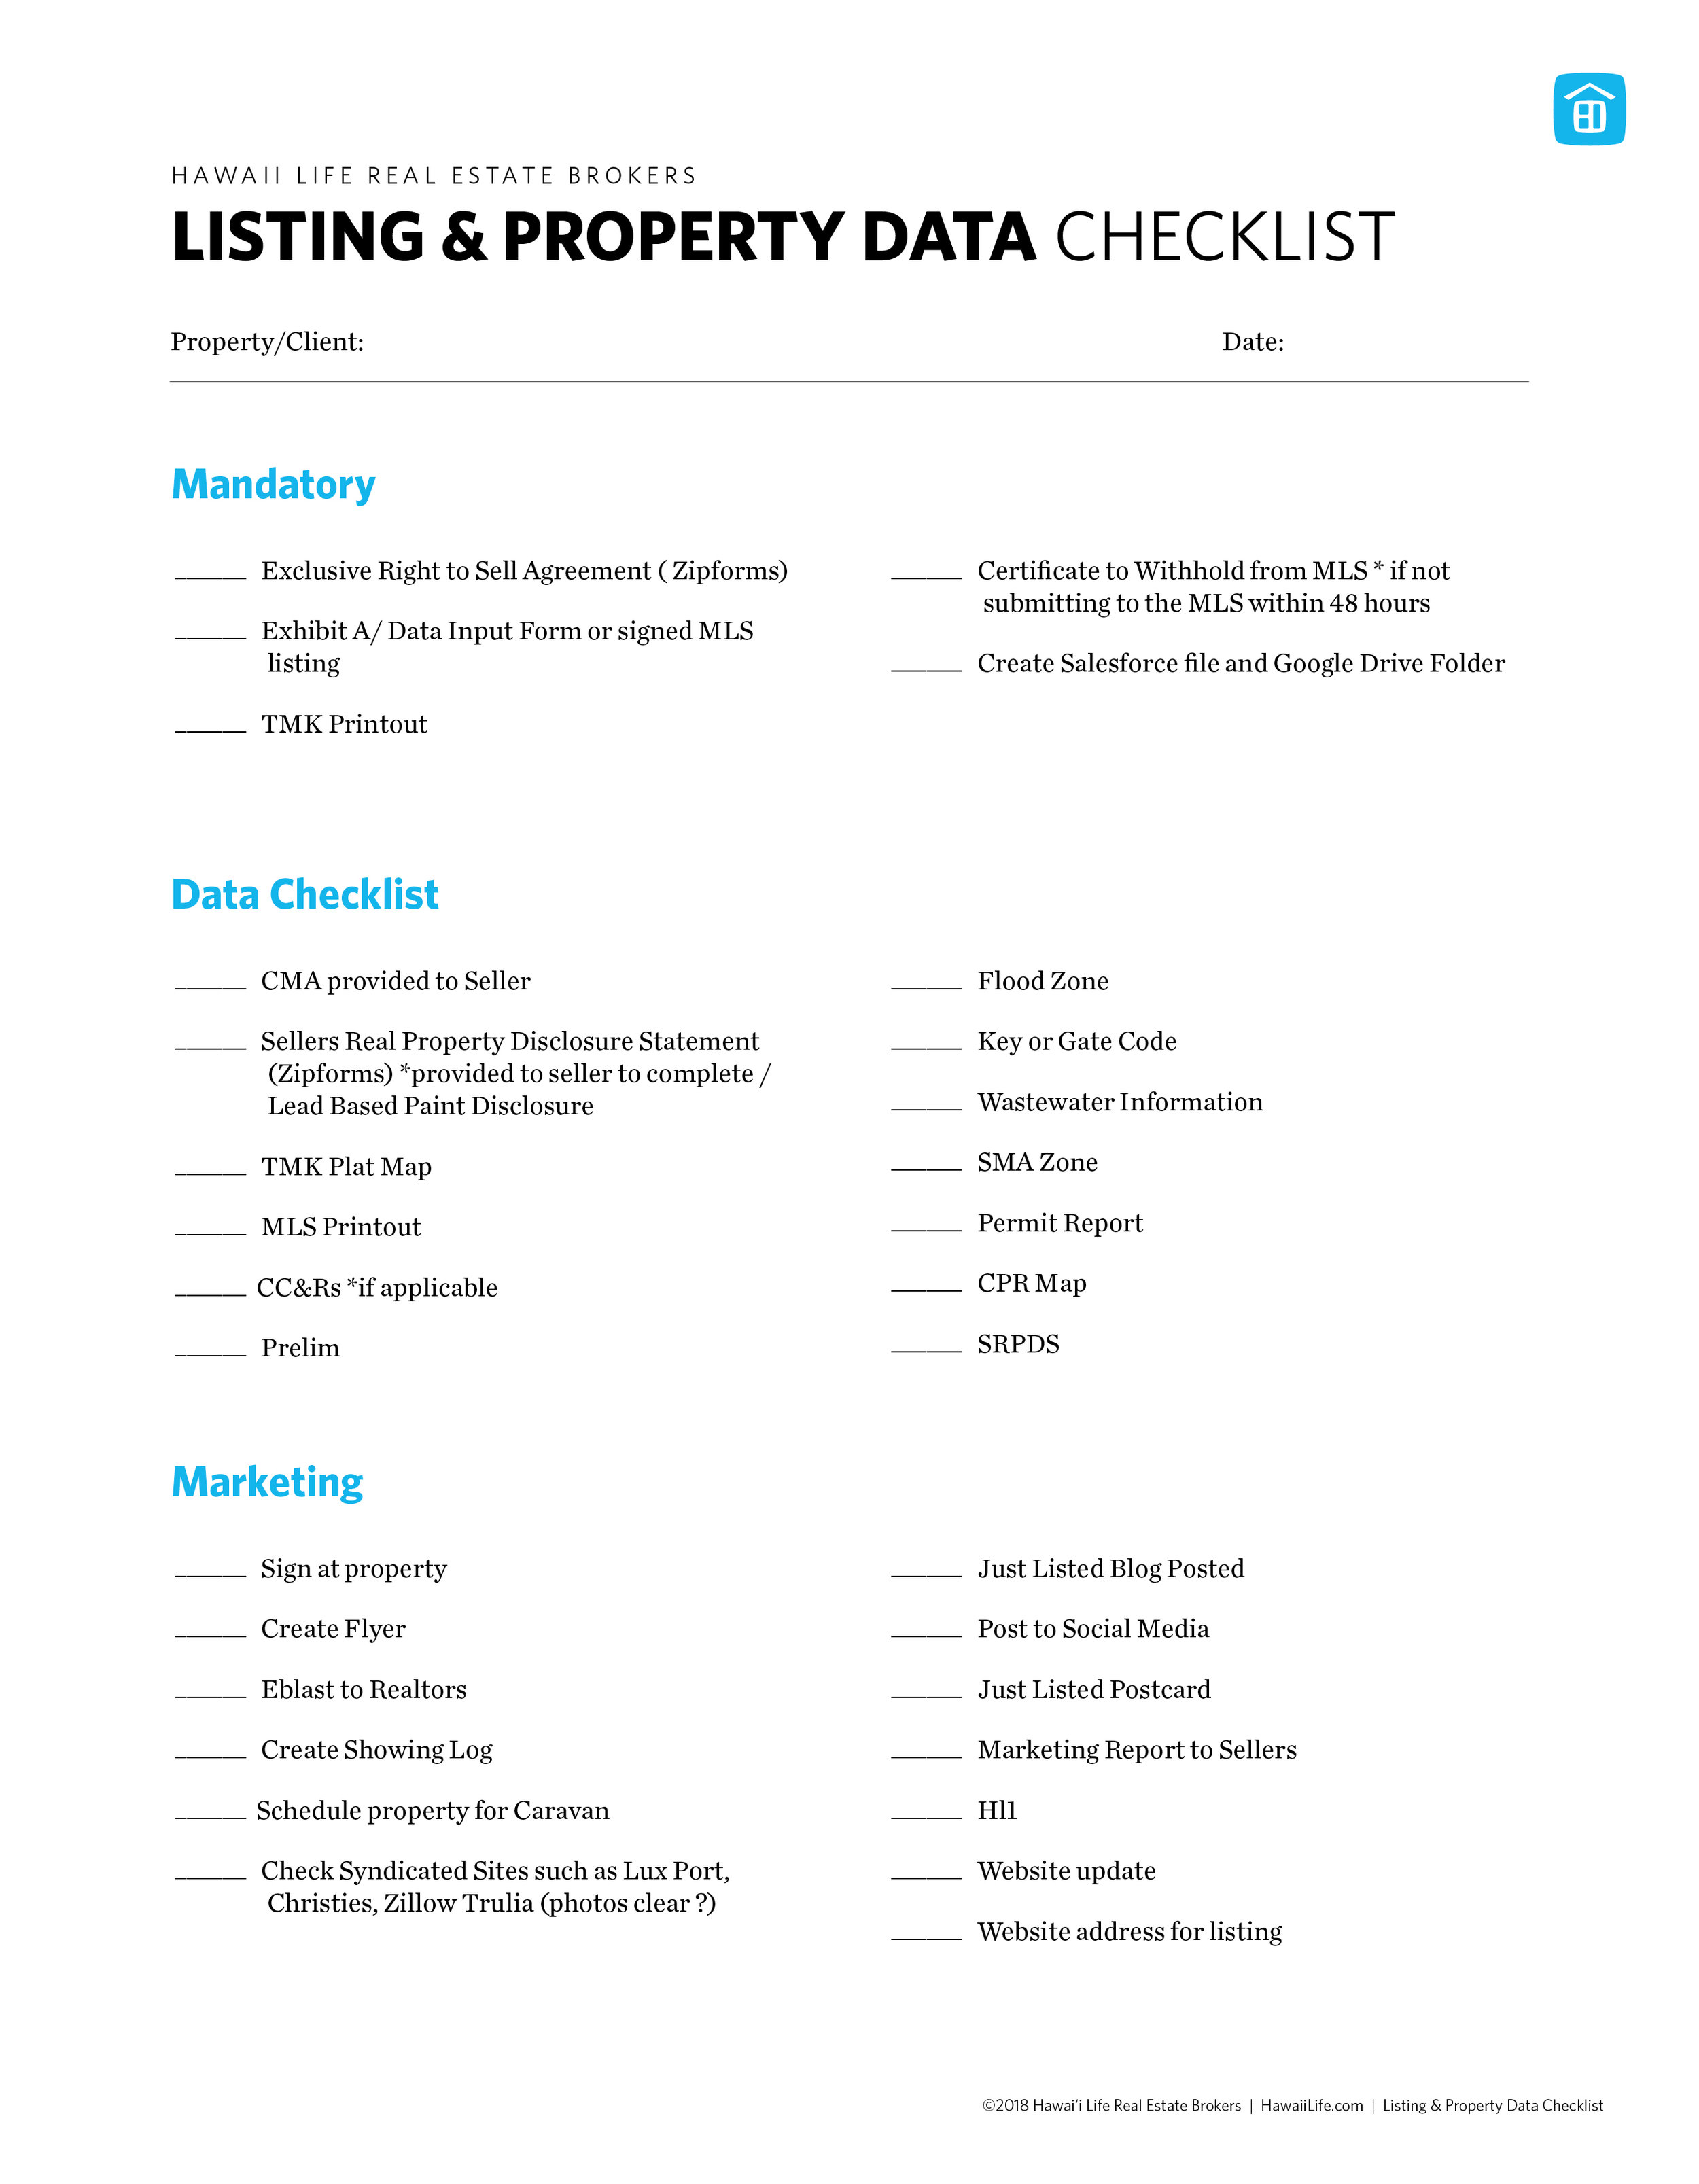 HL_ListingChecklist_2018.jpg